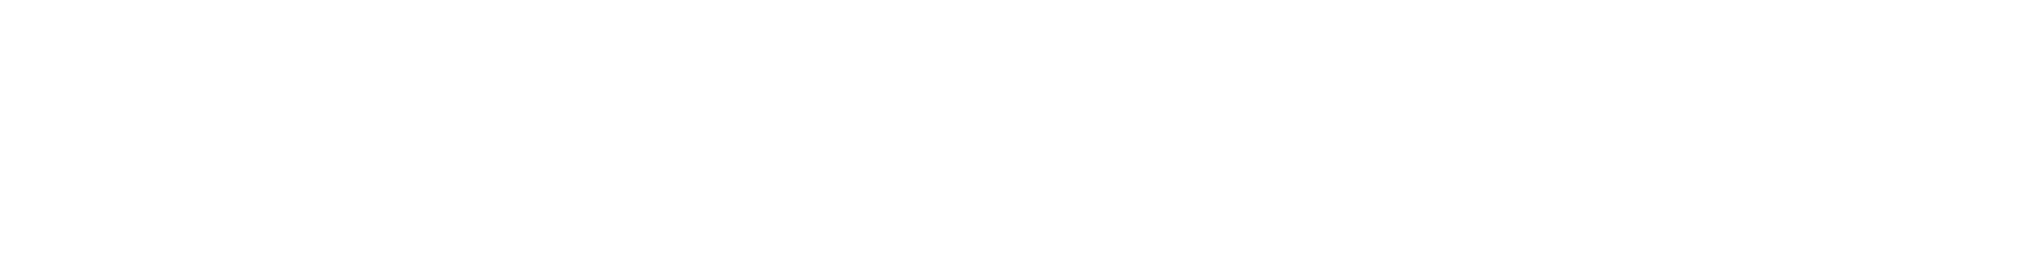 School of Literature, Media, and Communication